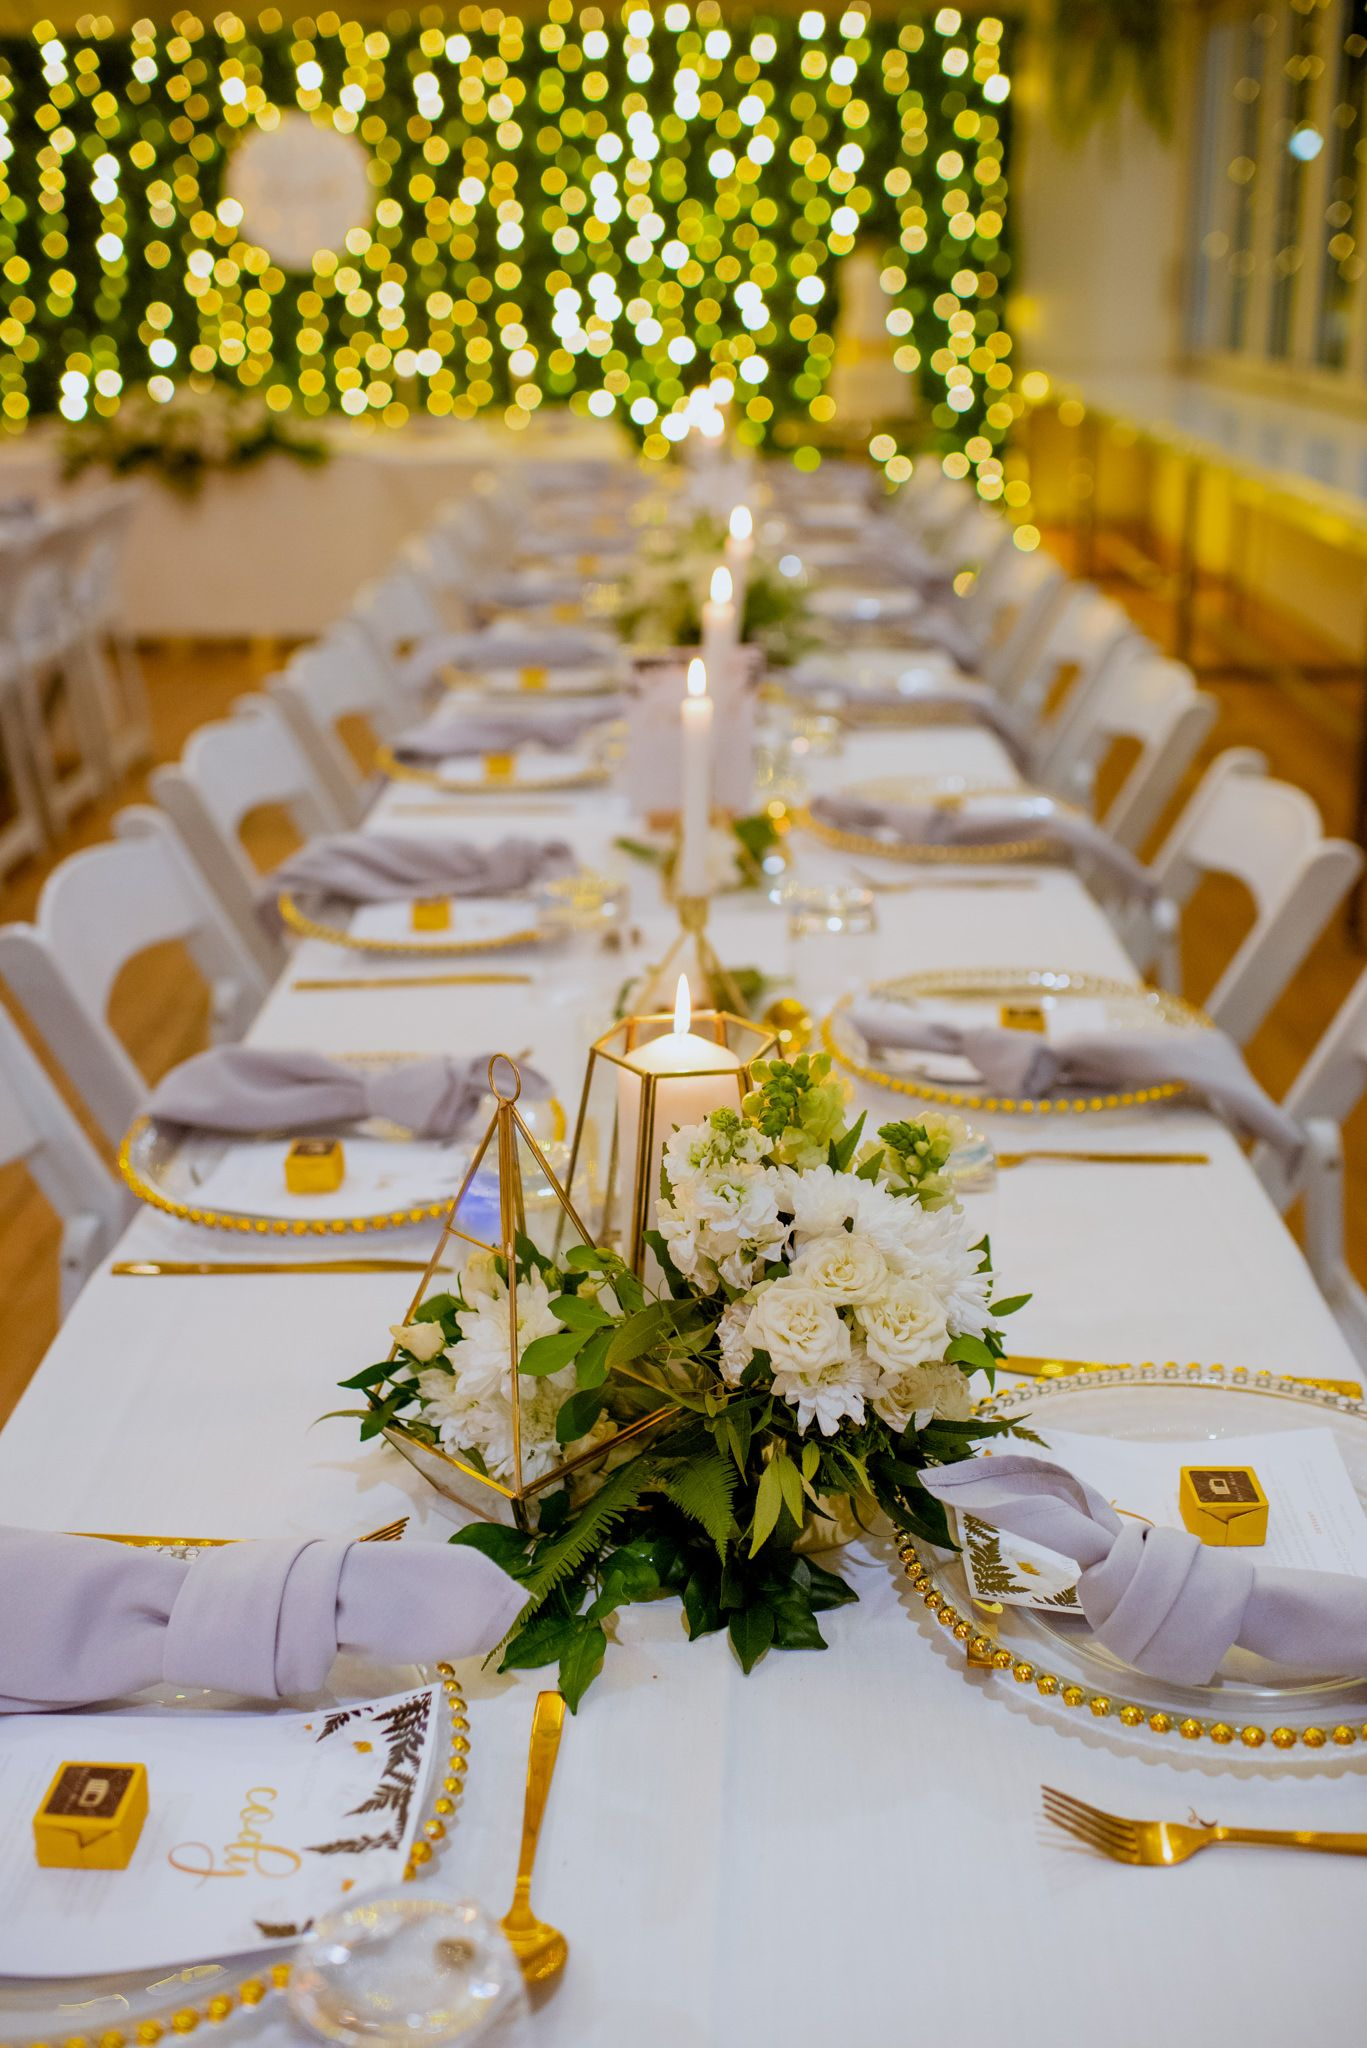 Northshore Harbour Cafe Weddings And Events Brisbane Riverside Venue Fairy Light Heaven Wedding Reception Venues Fairy Wedding Fairy Lights